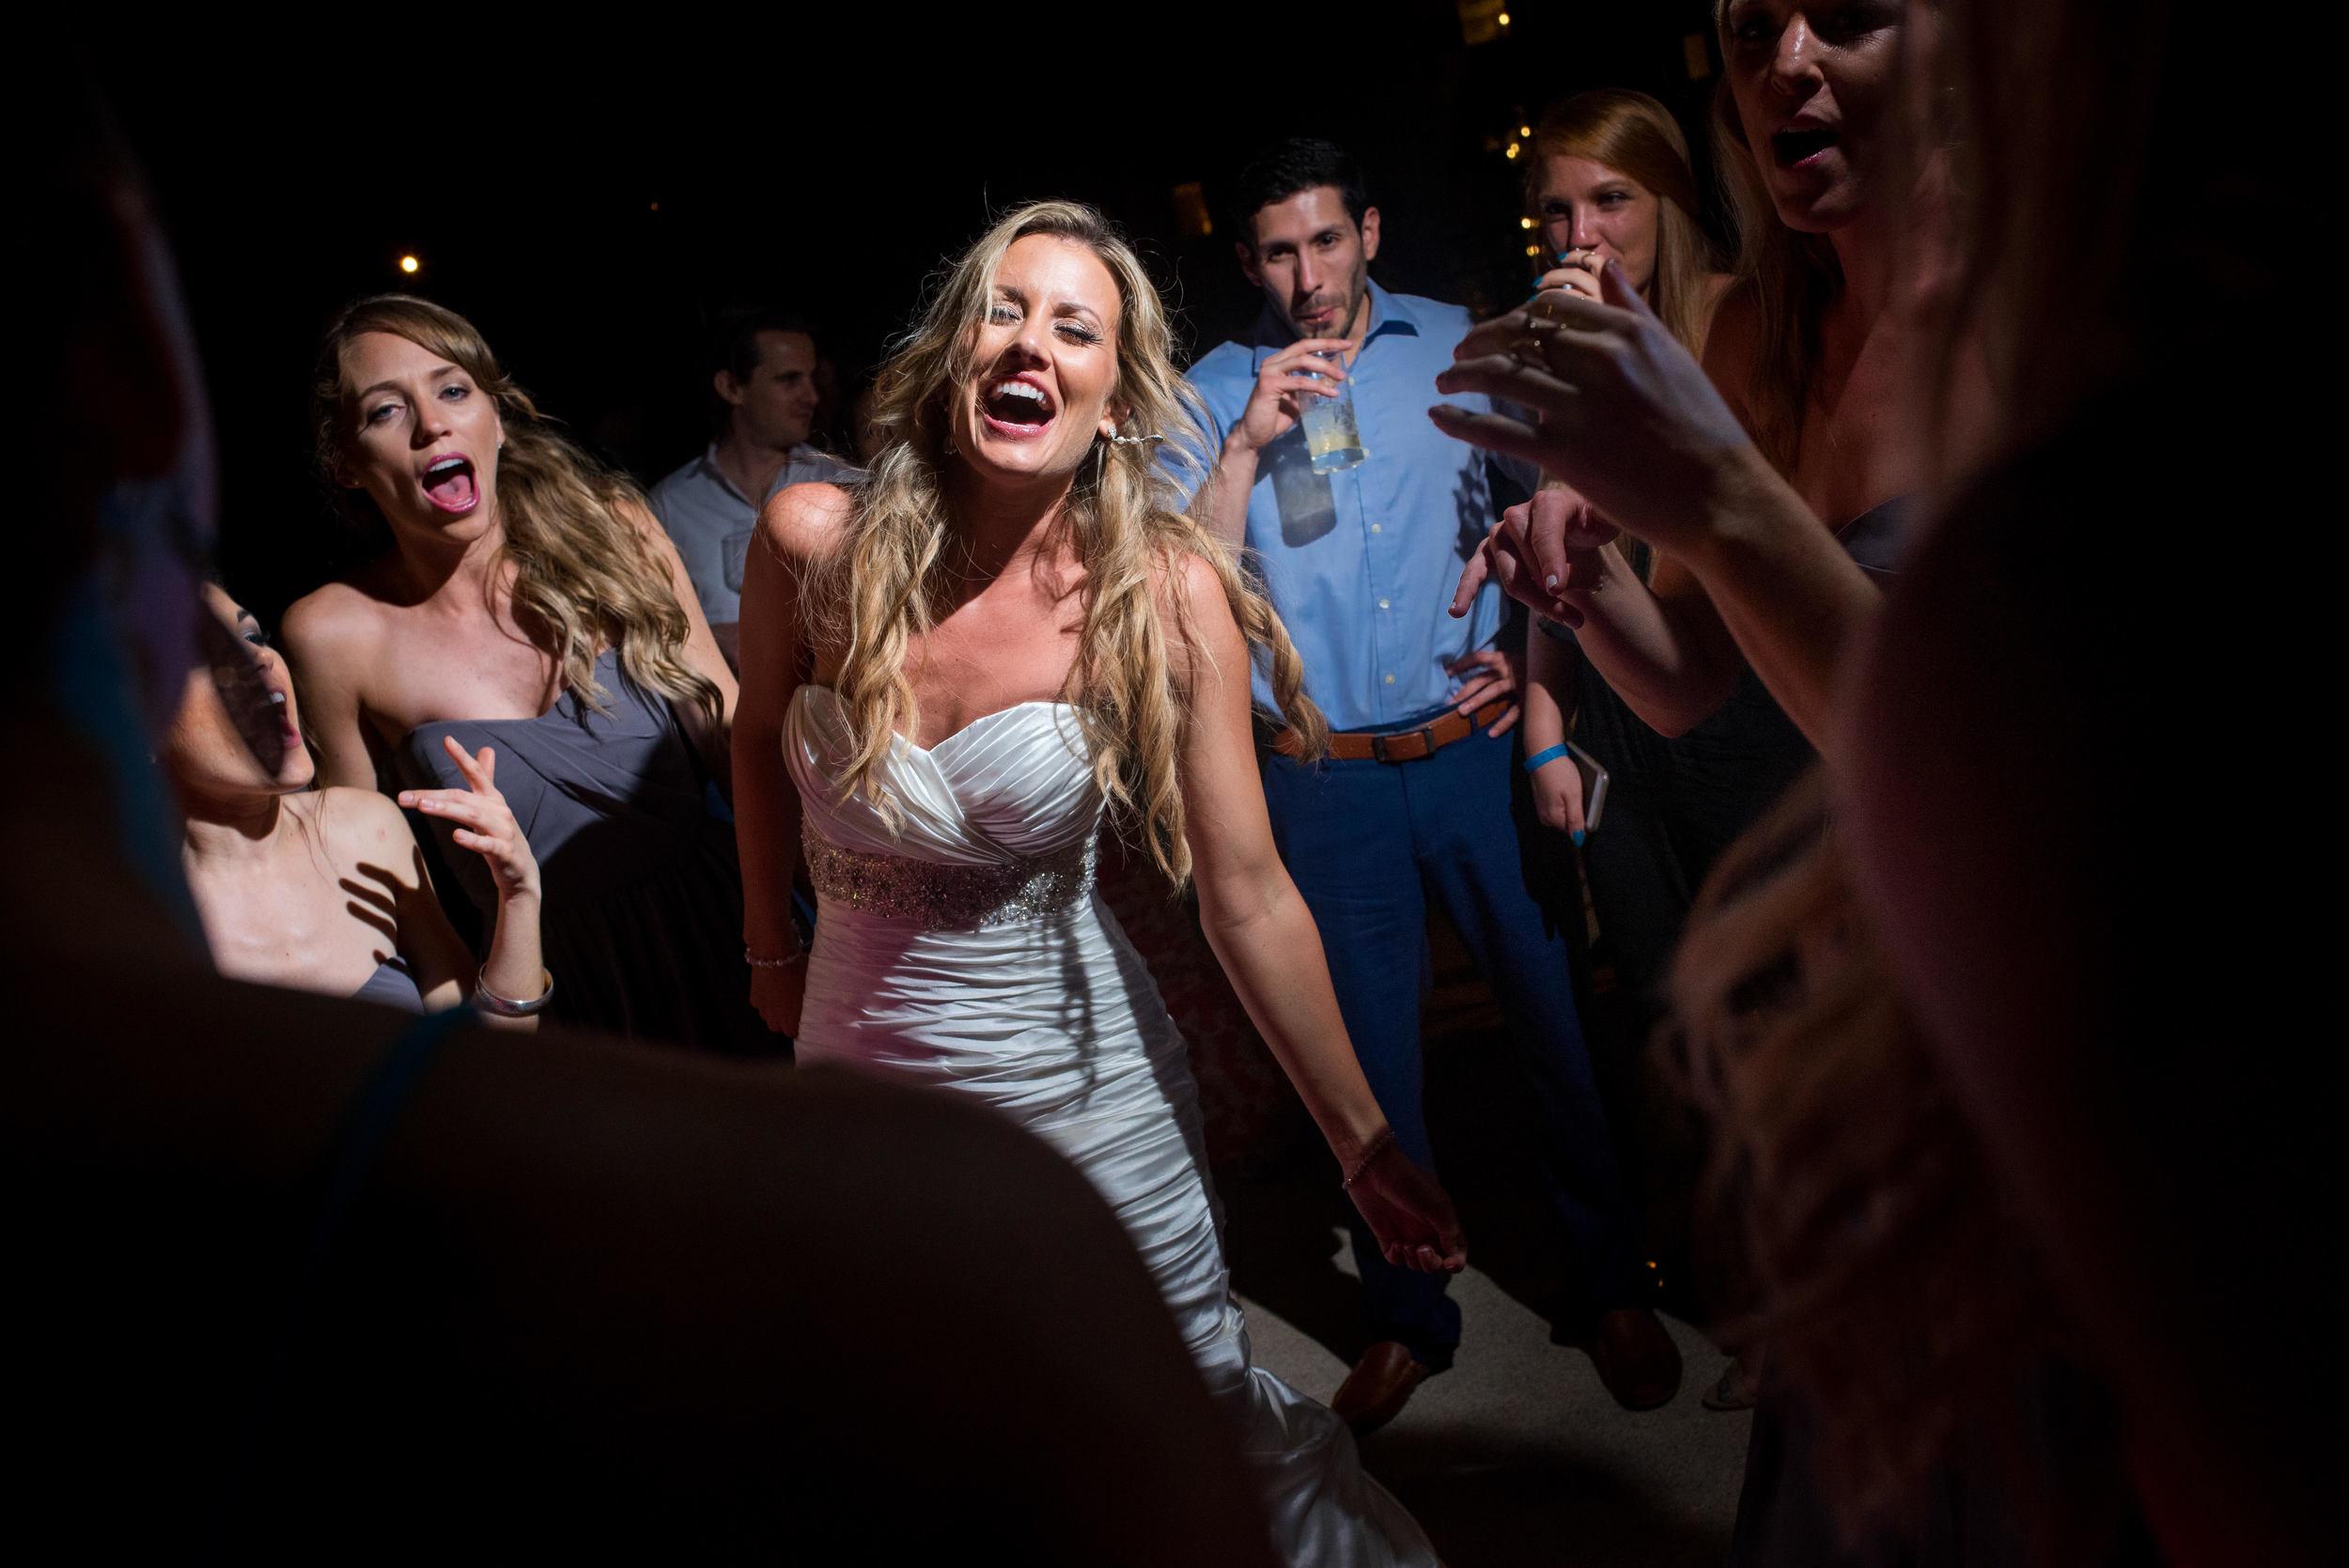 cabo wedding photographer-51.JPG